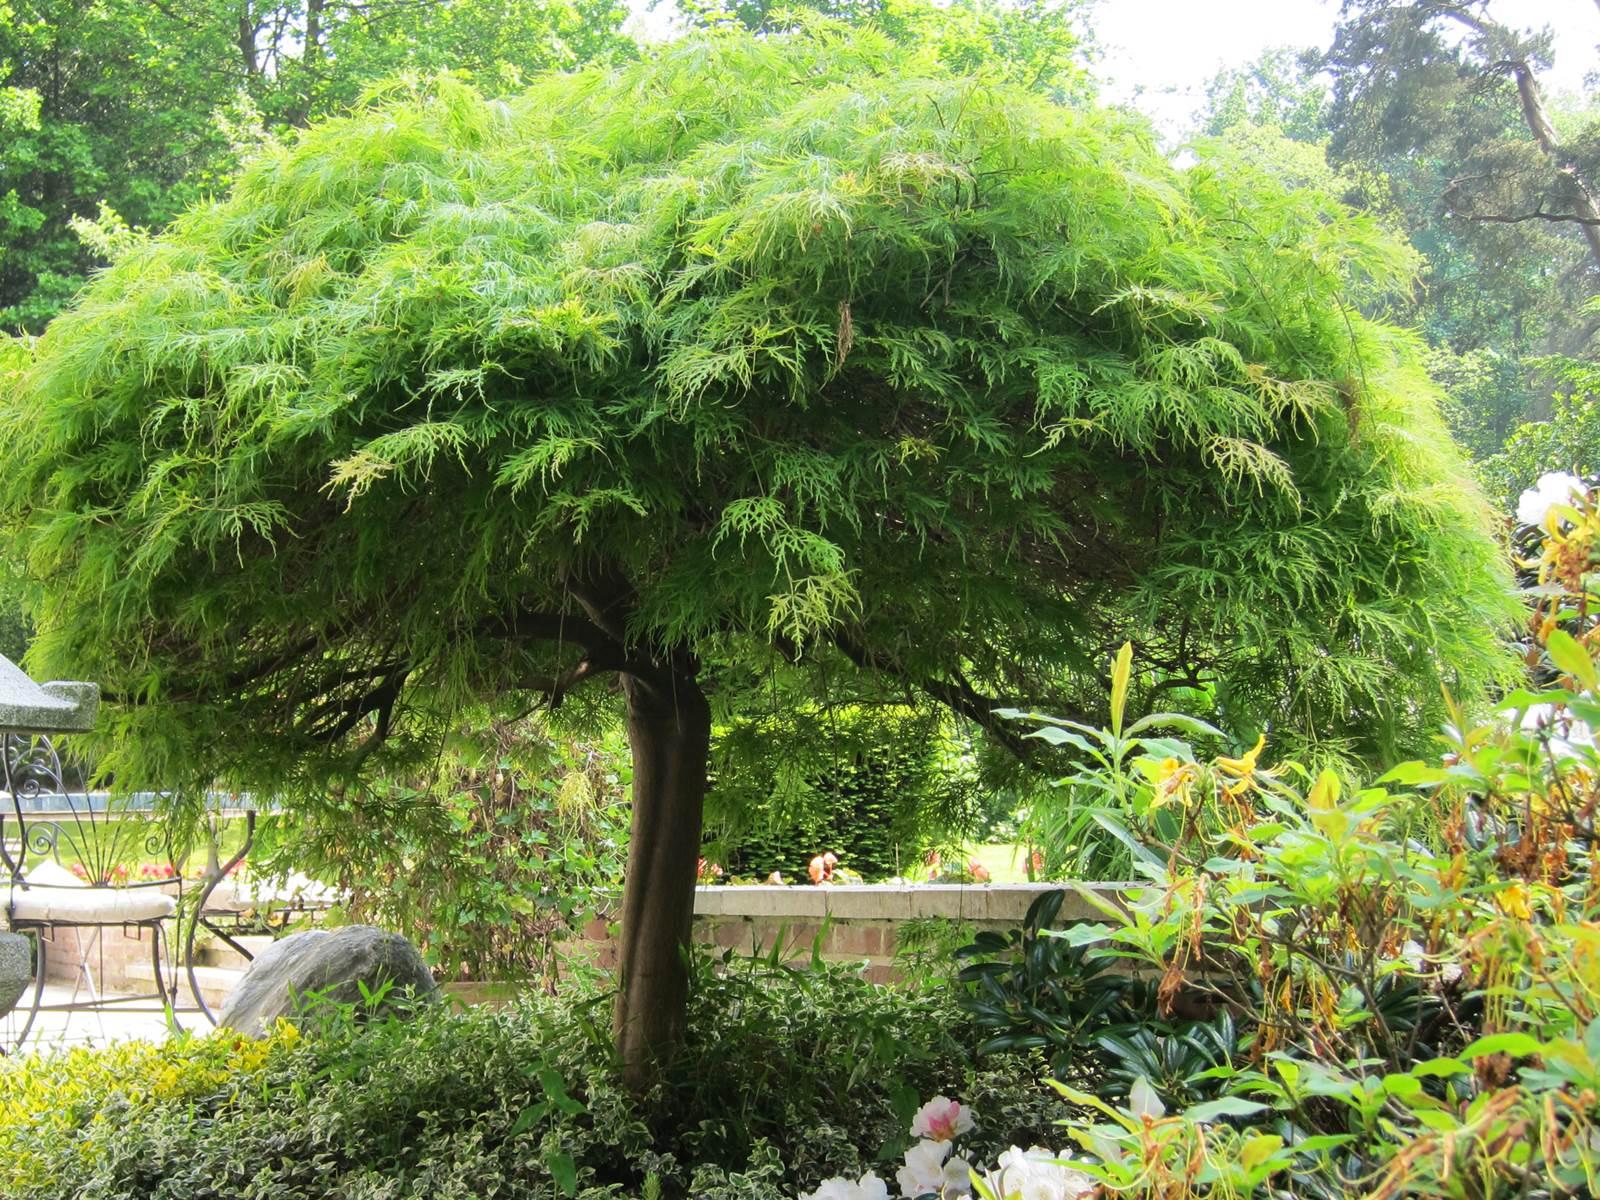 Arbre conseils de plantation la terre est un jardin for Conseil plantation jardin